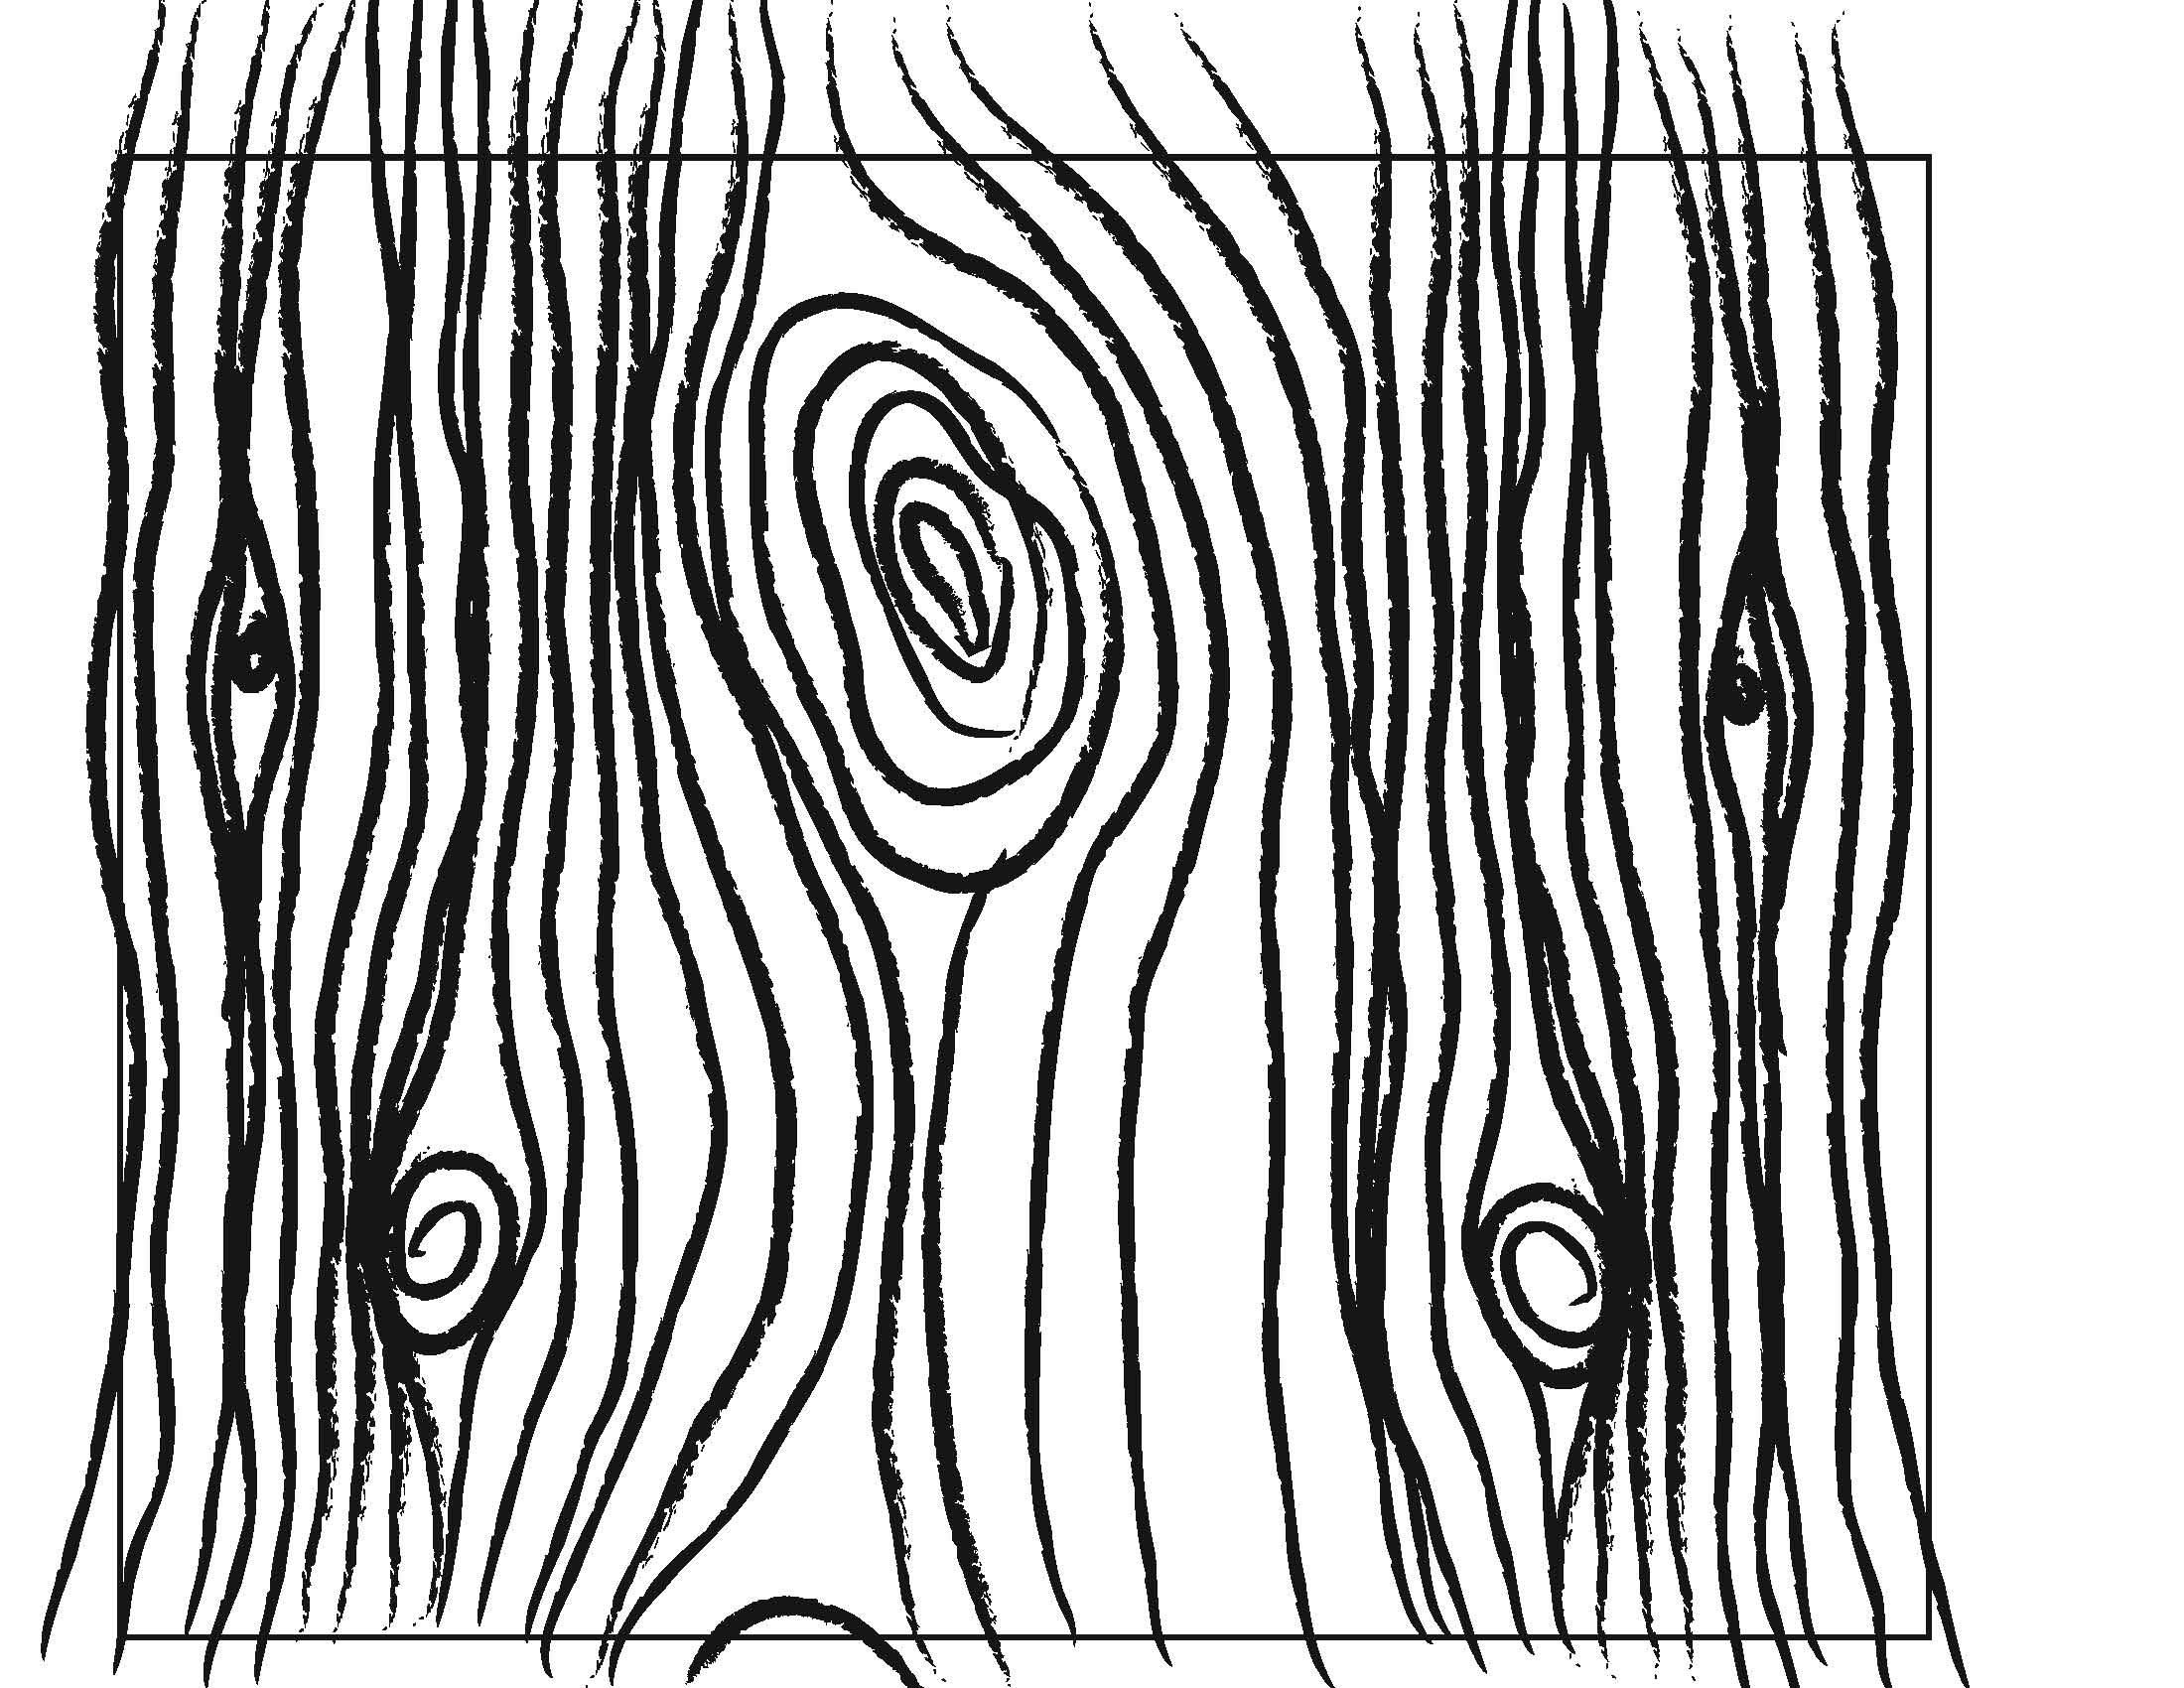 wood grain drawing at getdrawings com free for personal use wood rh getdrawings com vector image wood grain vector wood grain seamless